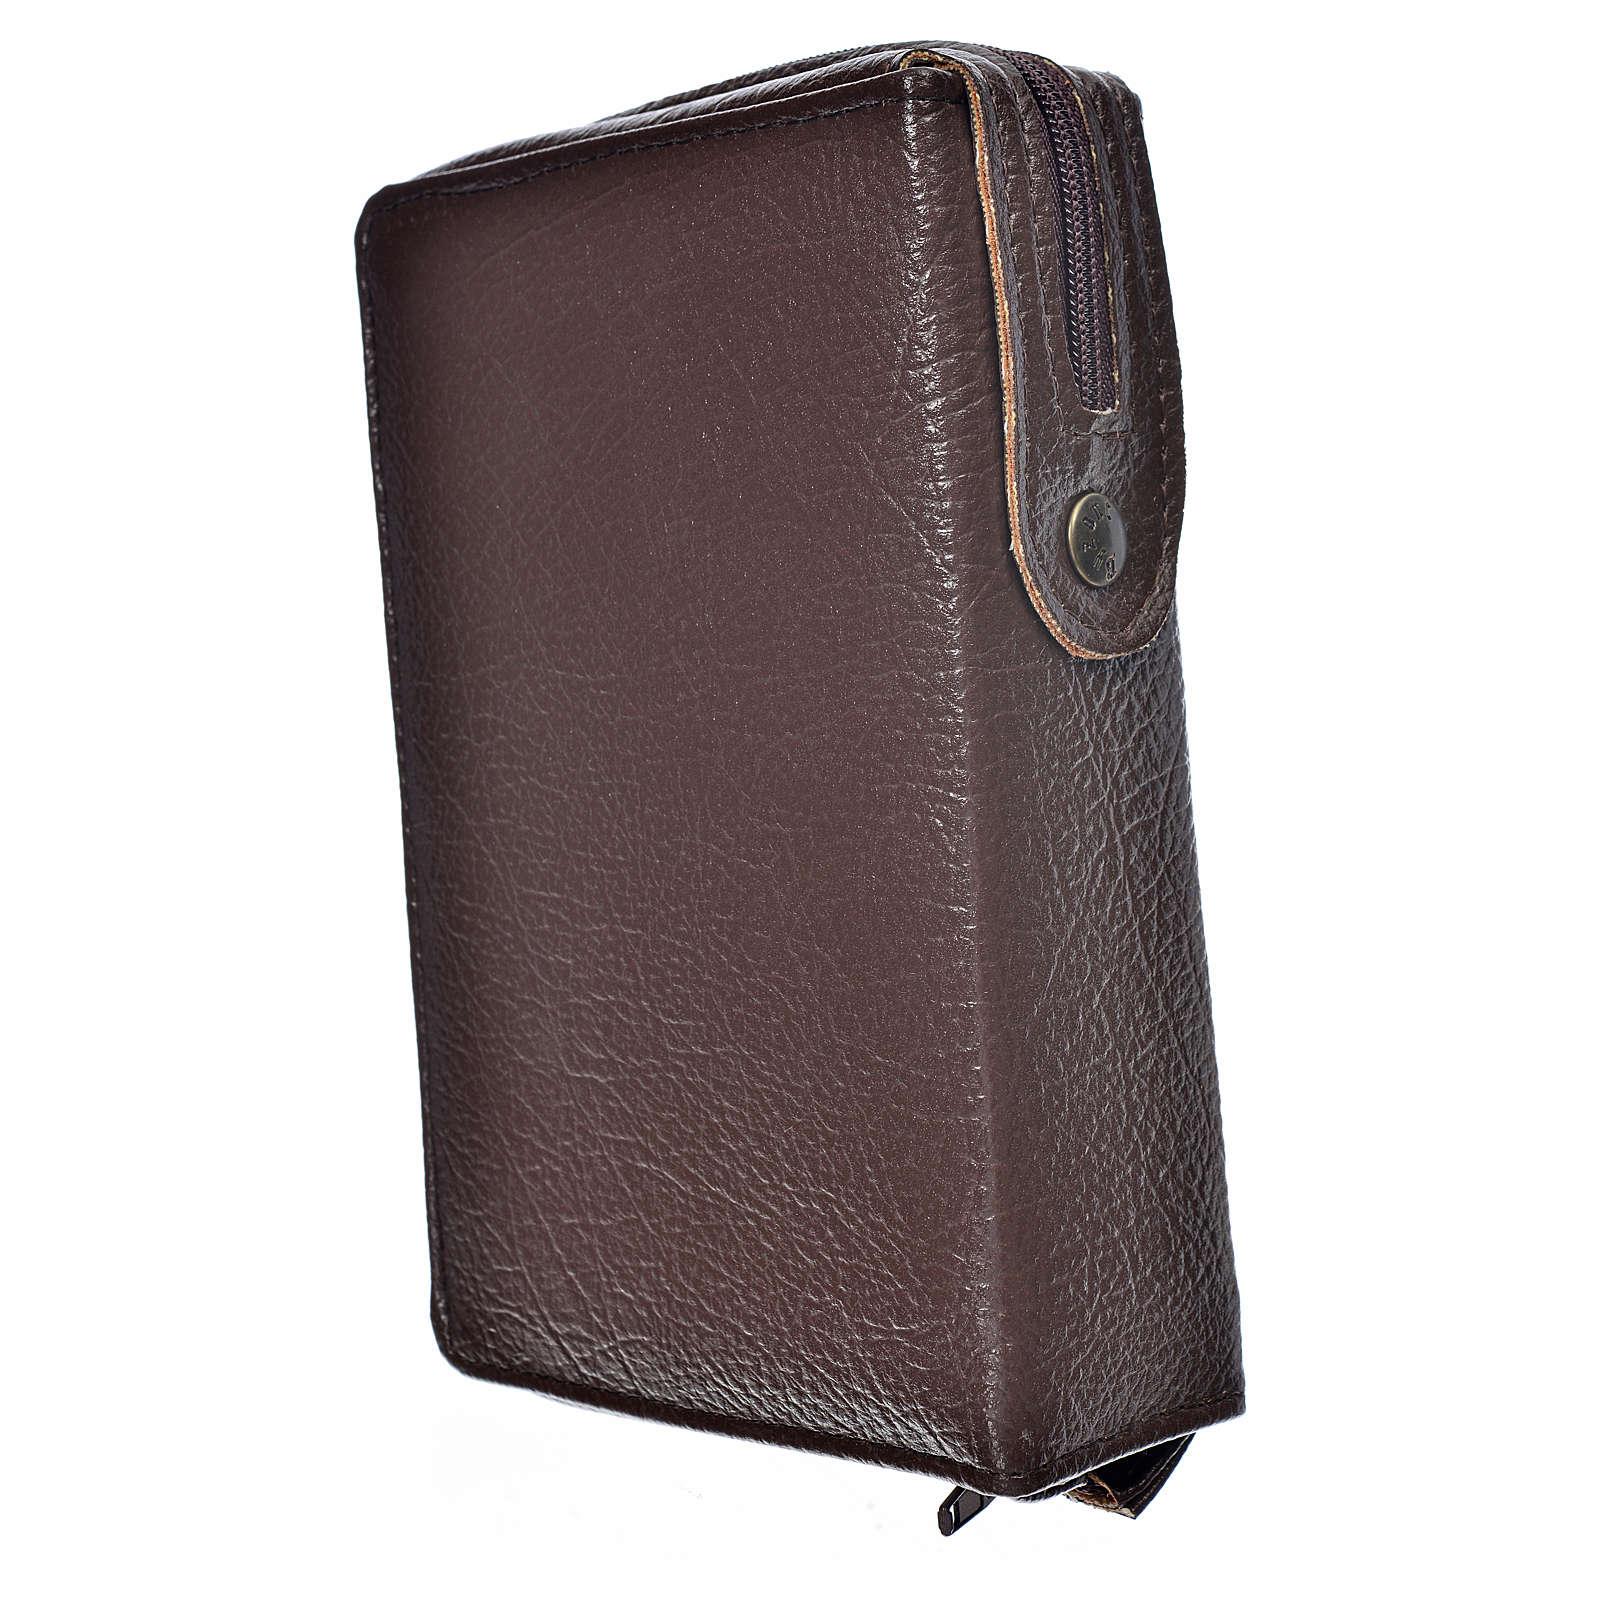 Funda Sagrada Biblia CEE ED. Pop. marrón oscuro simil c. Pant. 4